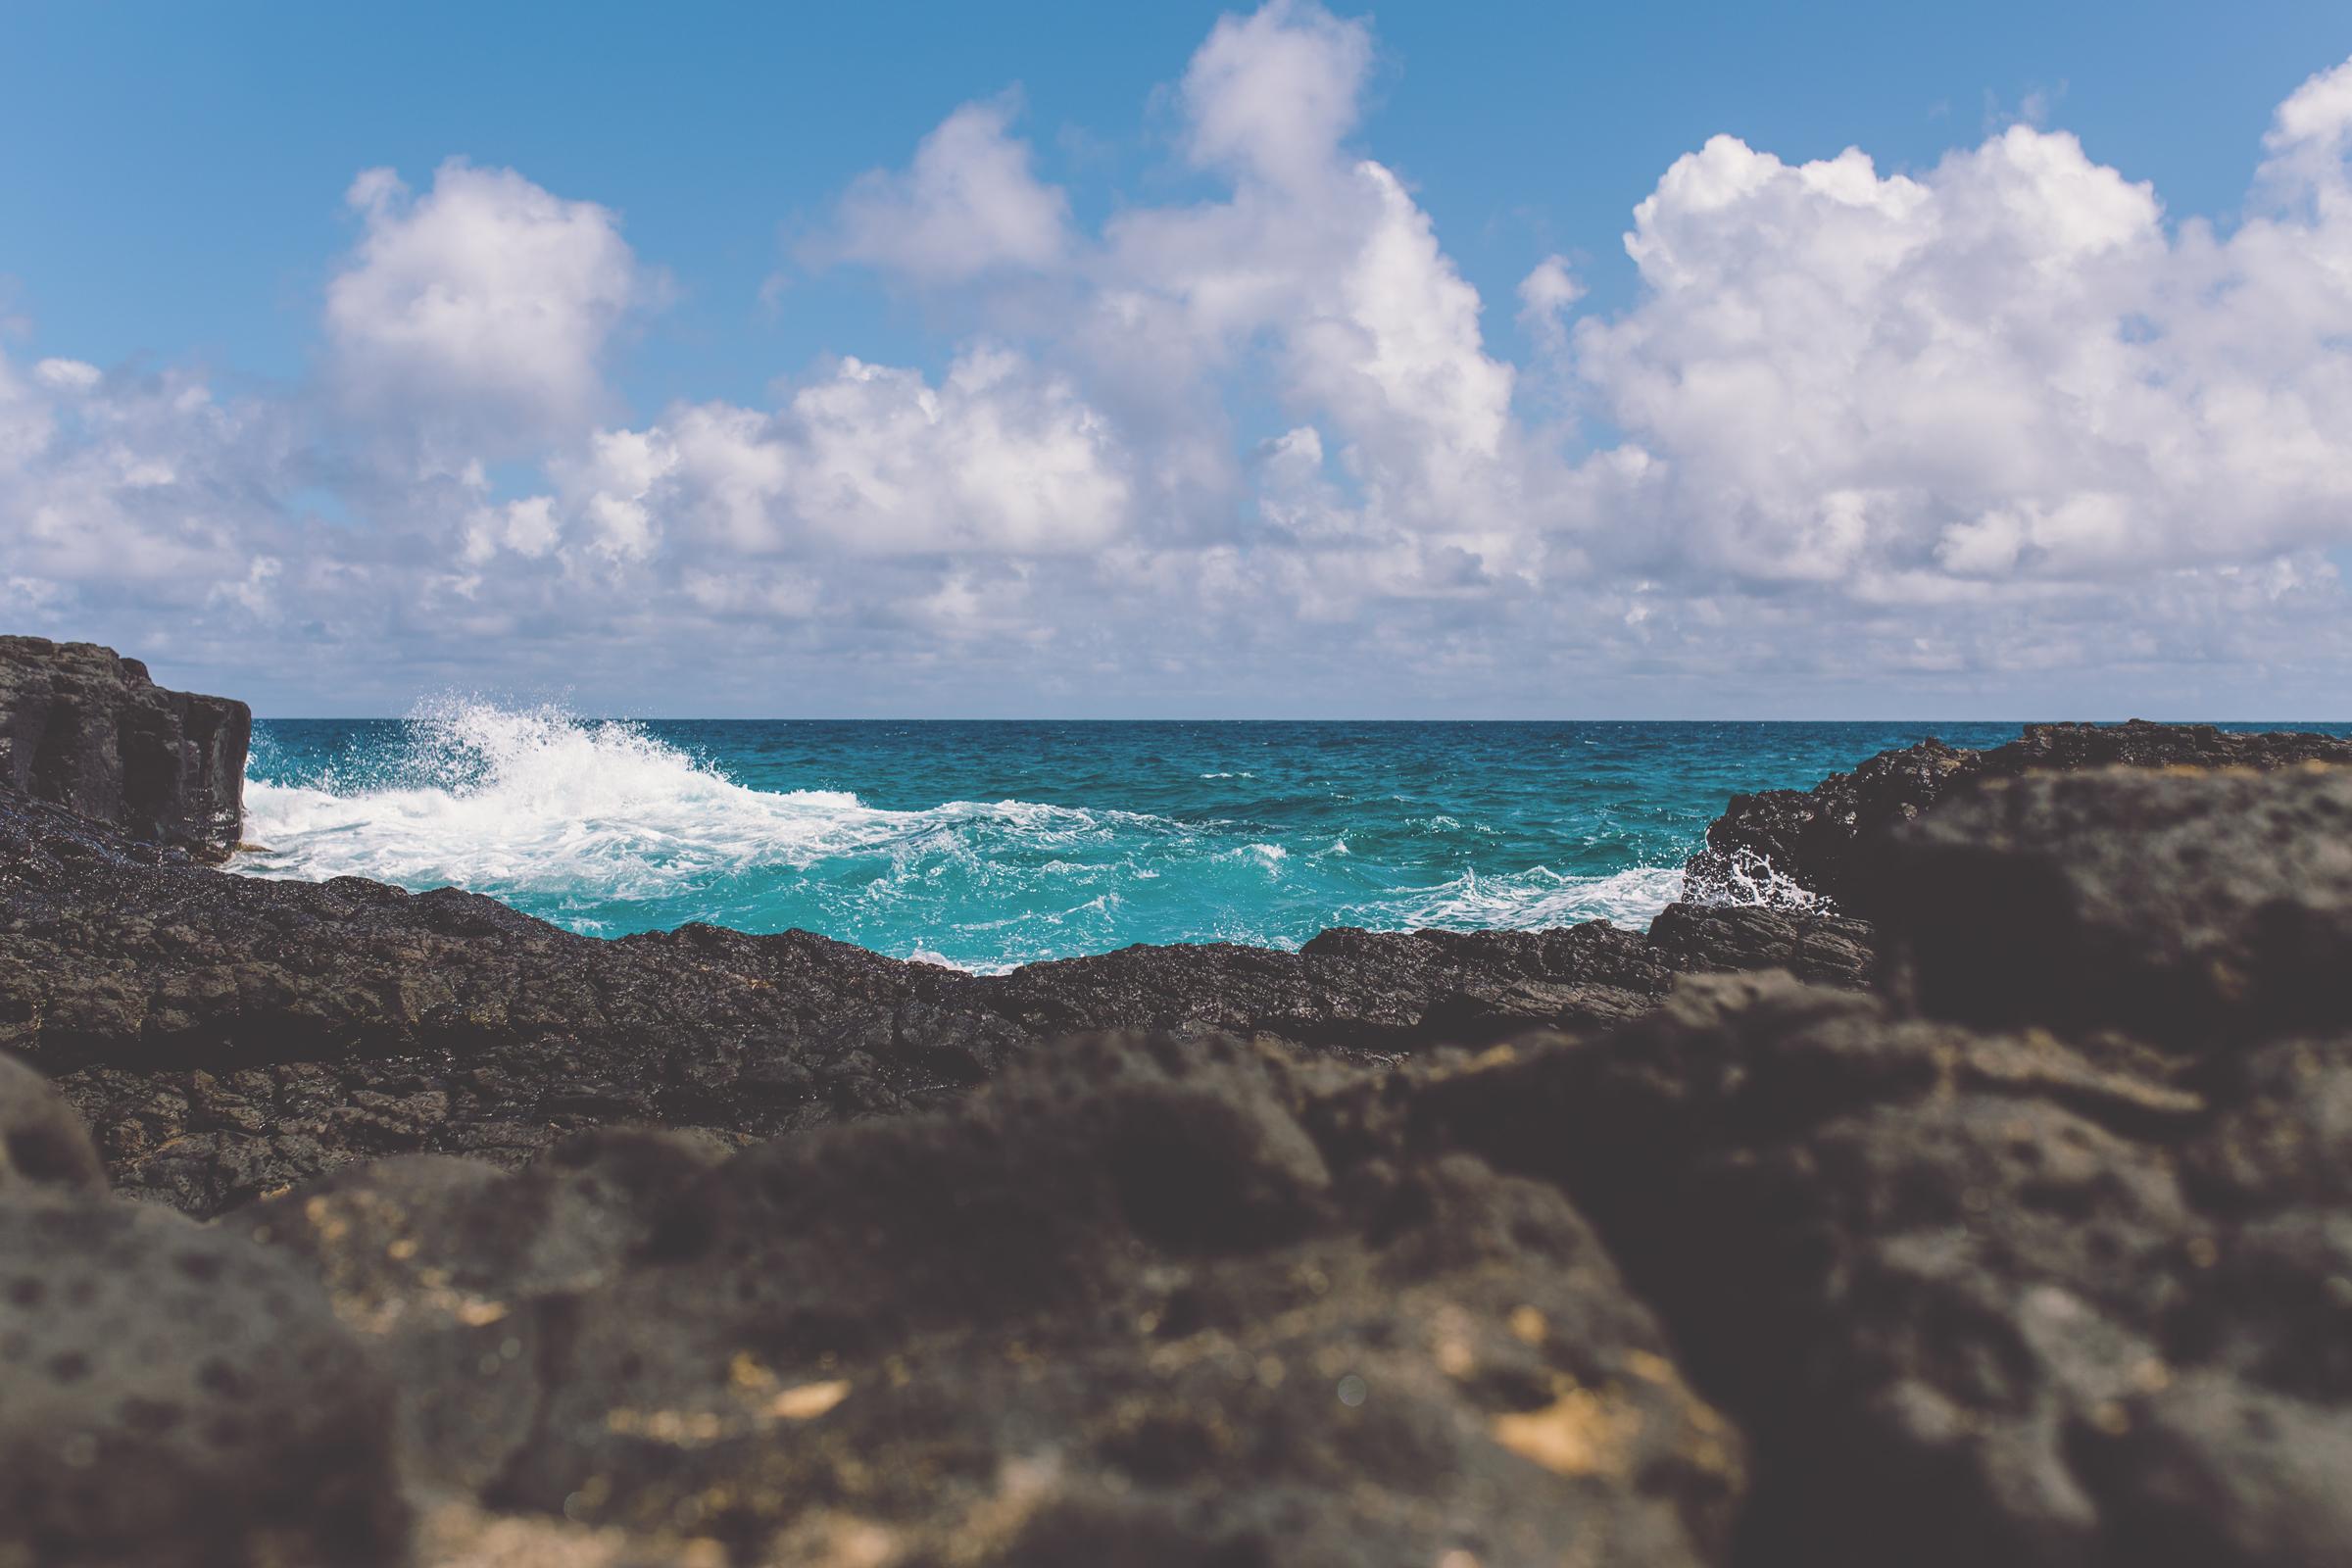 IMG_2457--KAUAI-HAWAII-JENNIFER-PICARD-PHOTOGRAPHY.jpg